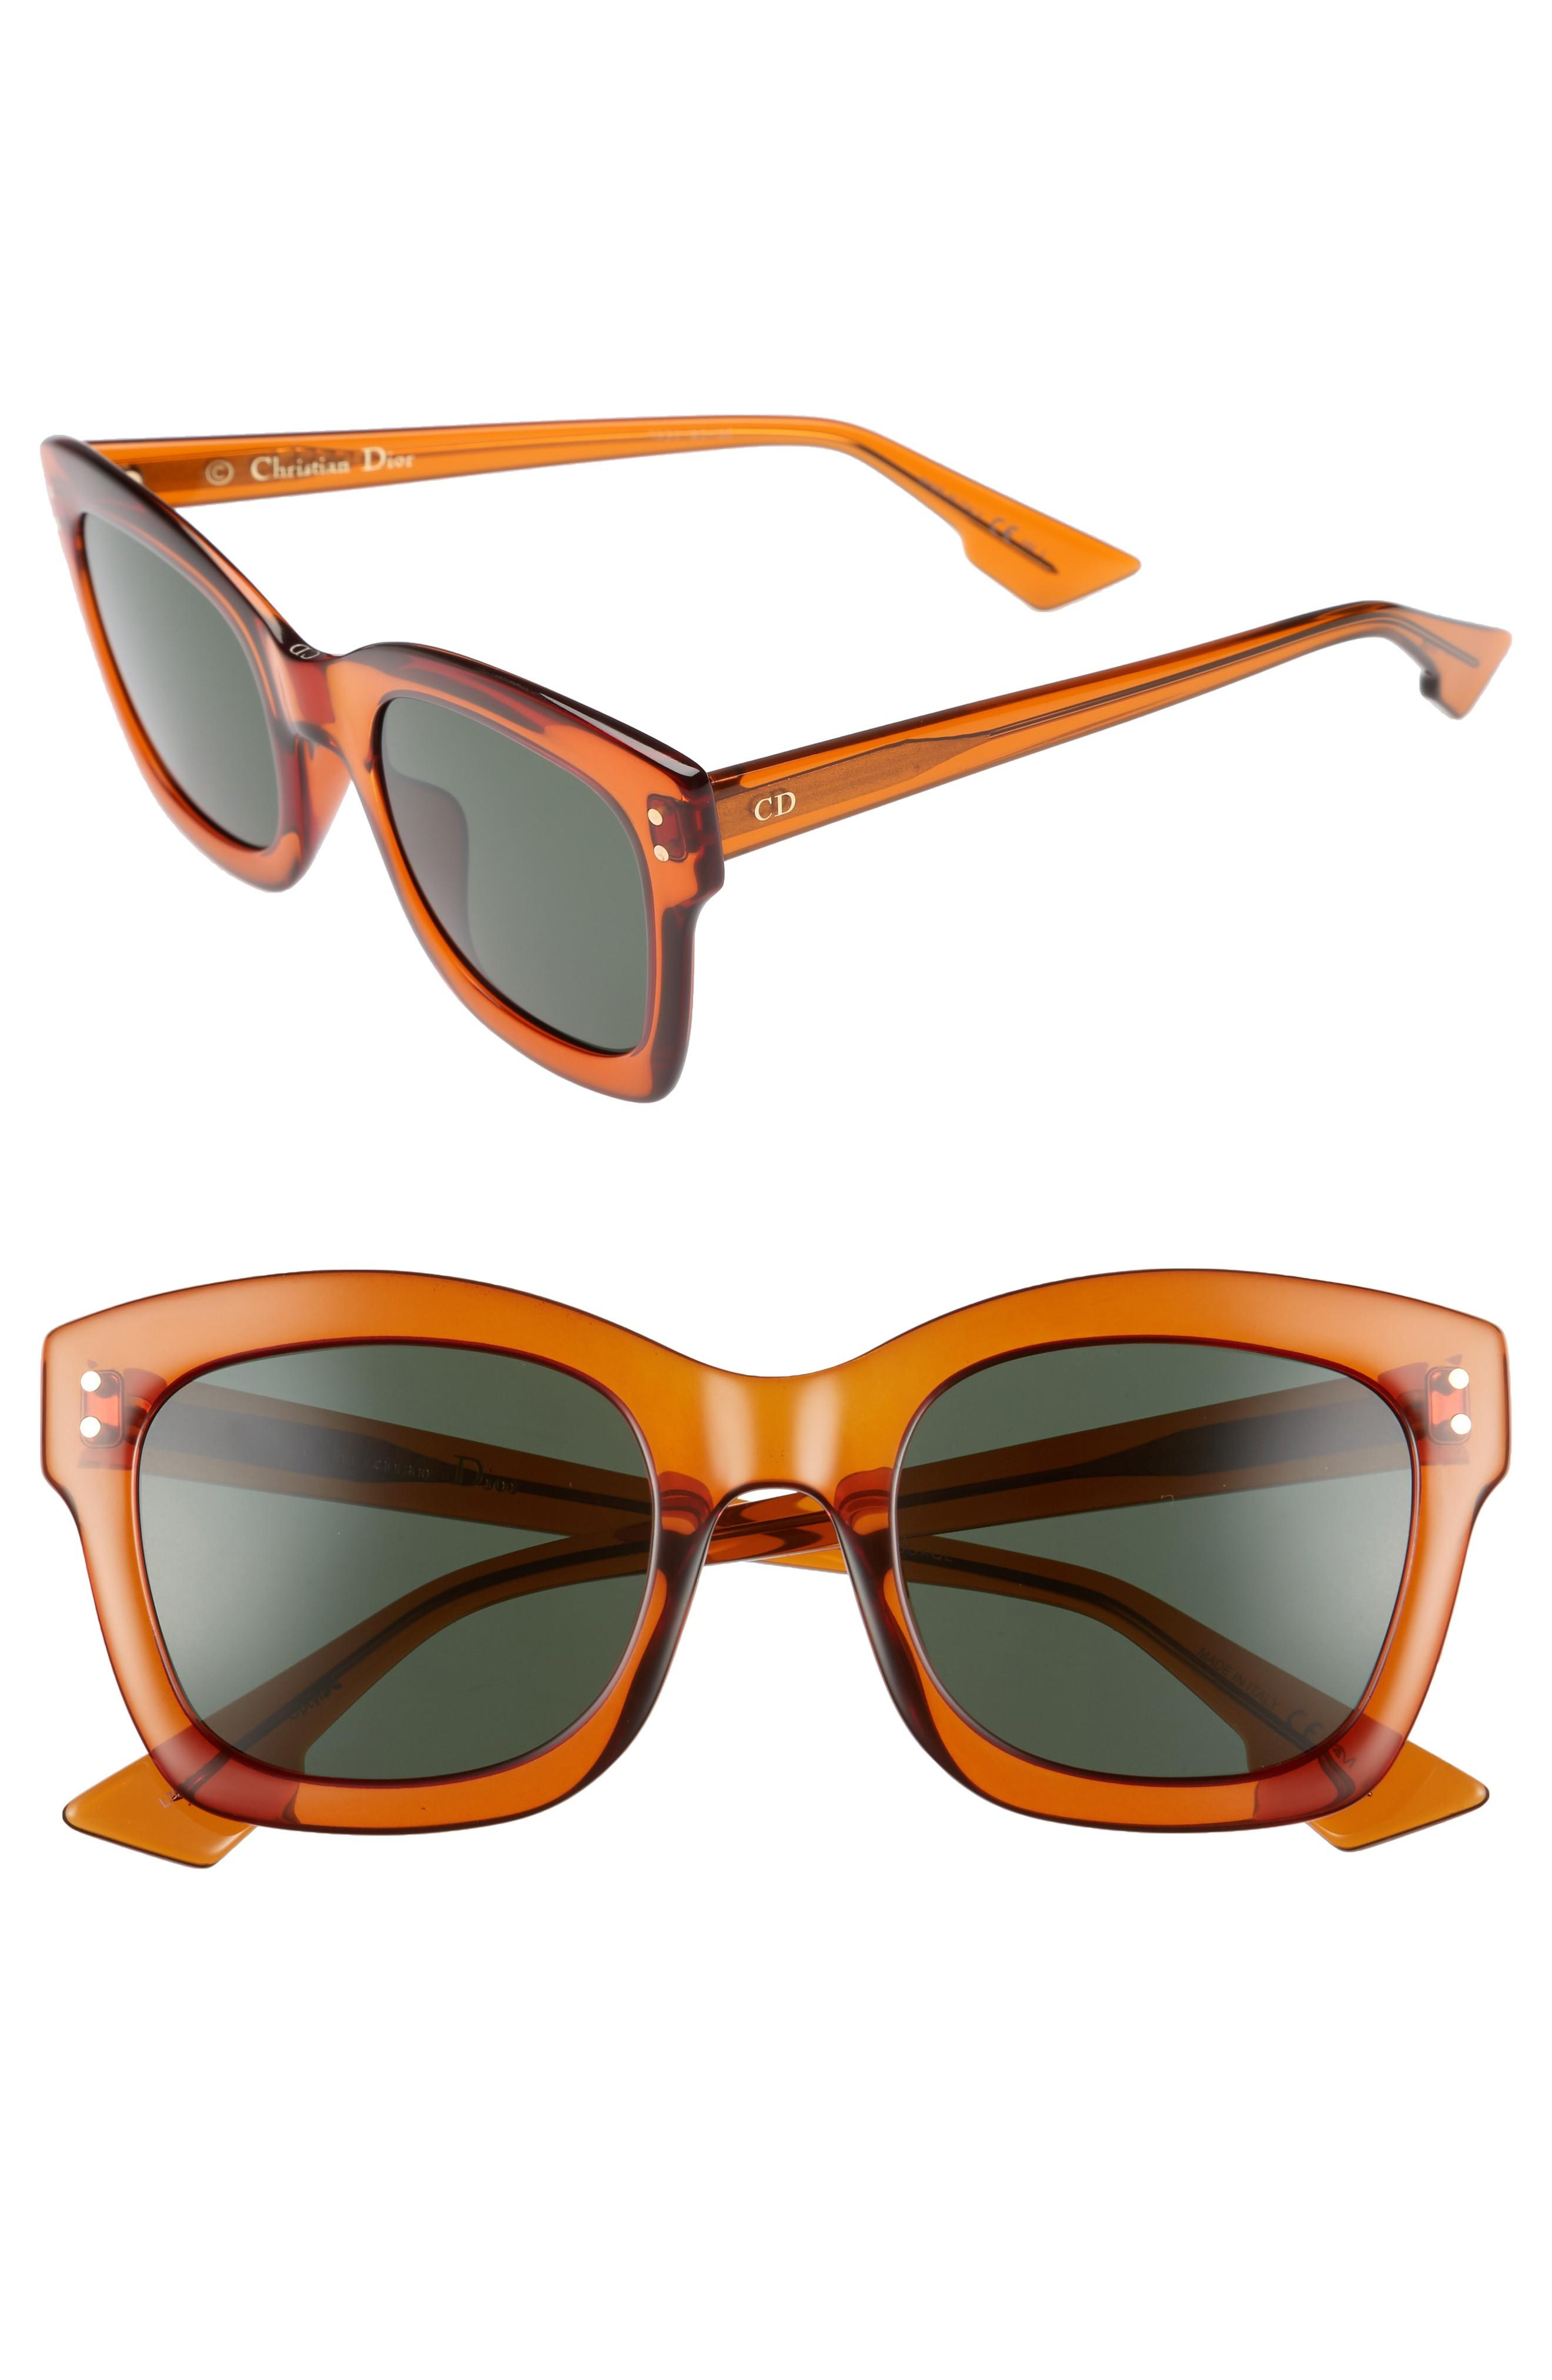 4217da62991dc Dior Izon 51Mm Sunglasses - Orange